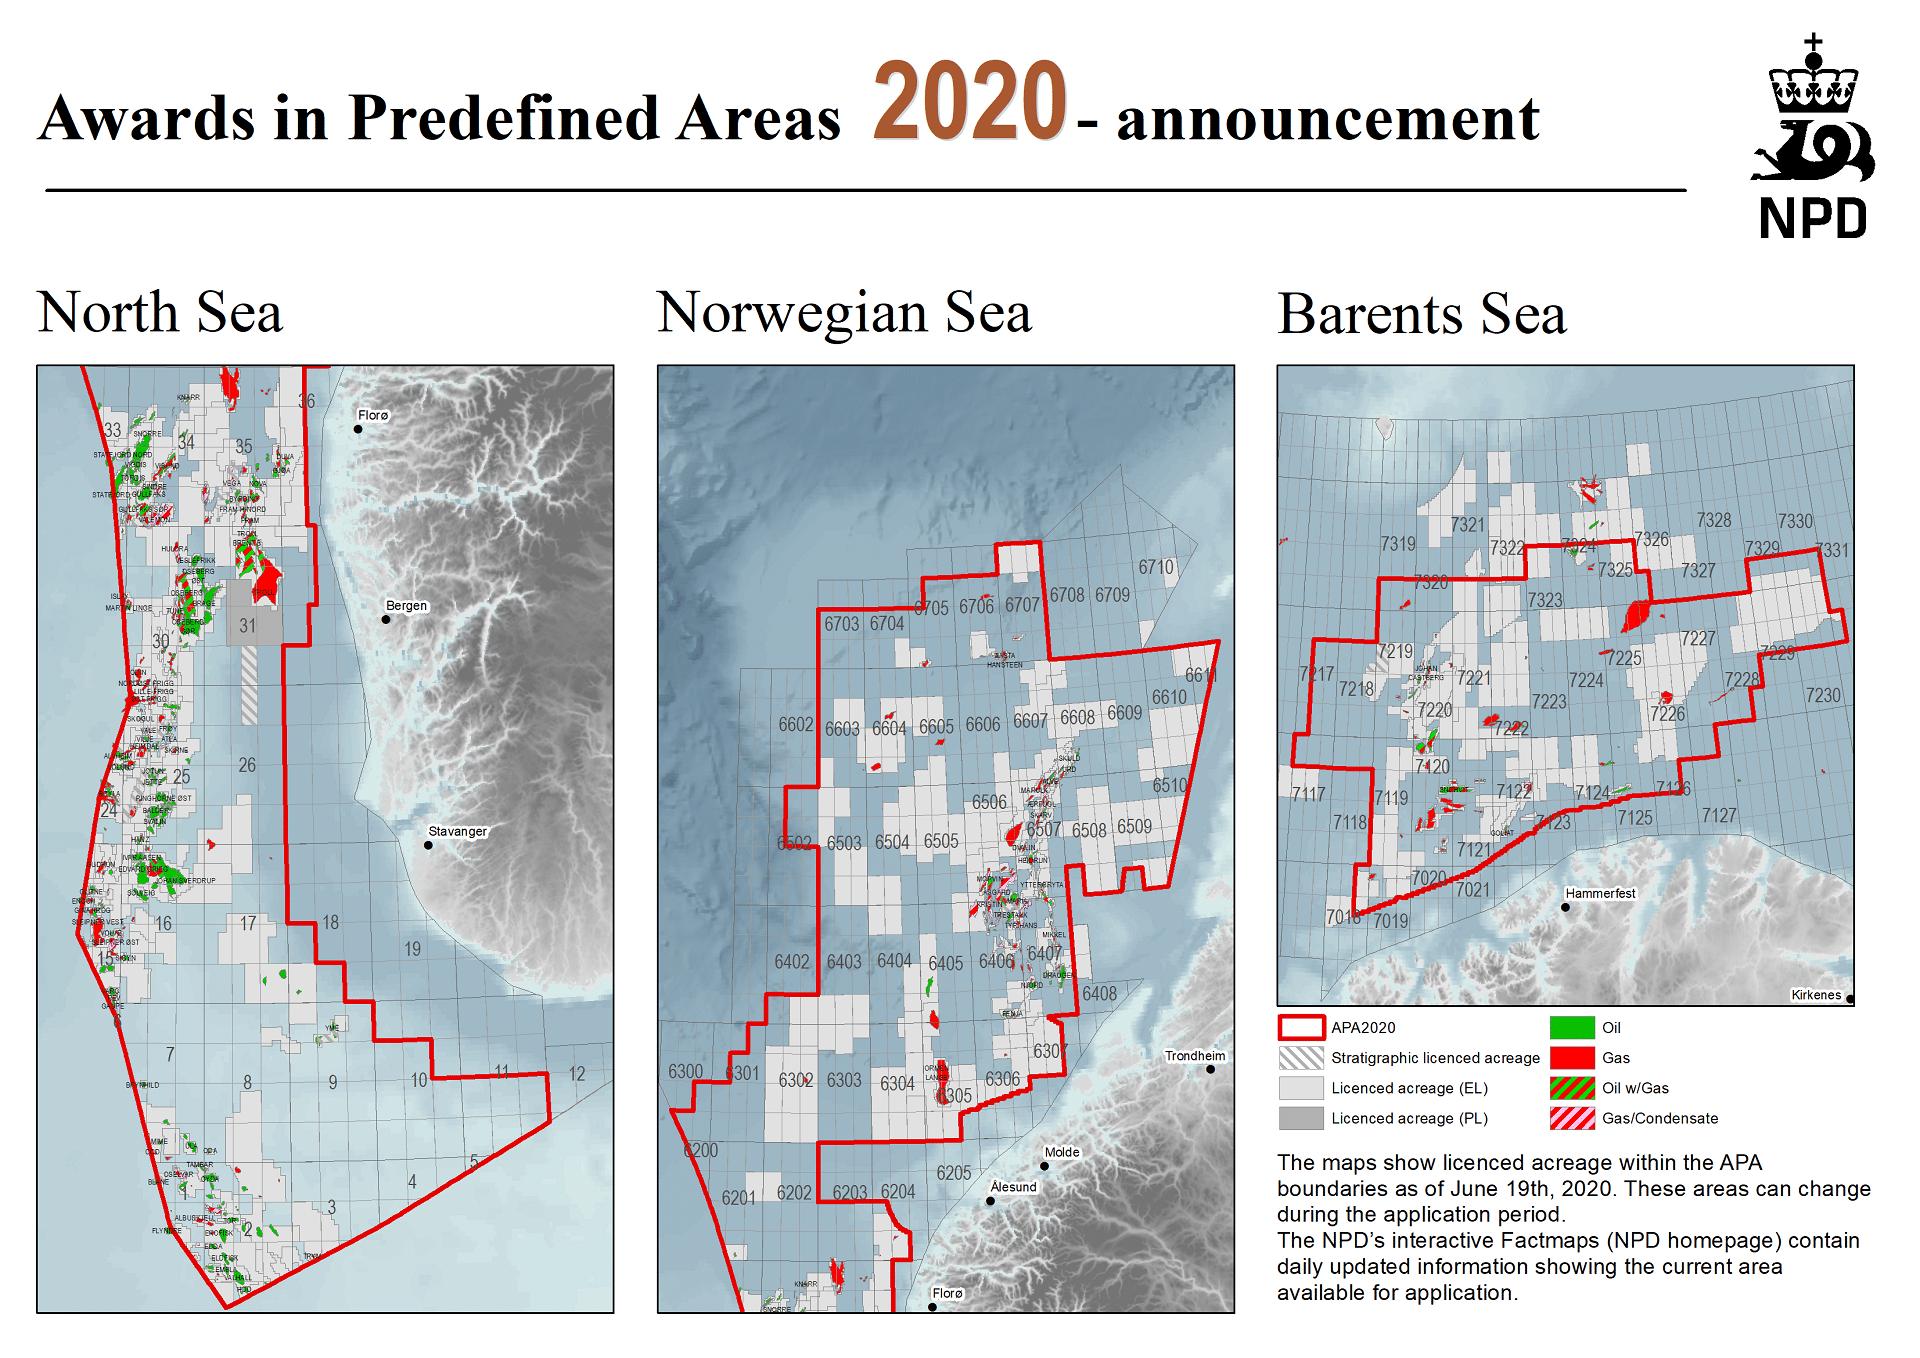 New acreage in the Norwegian Sea